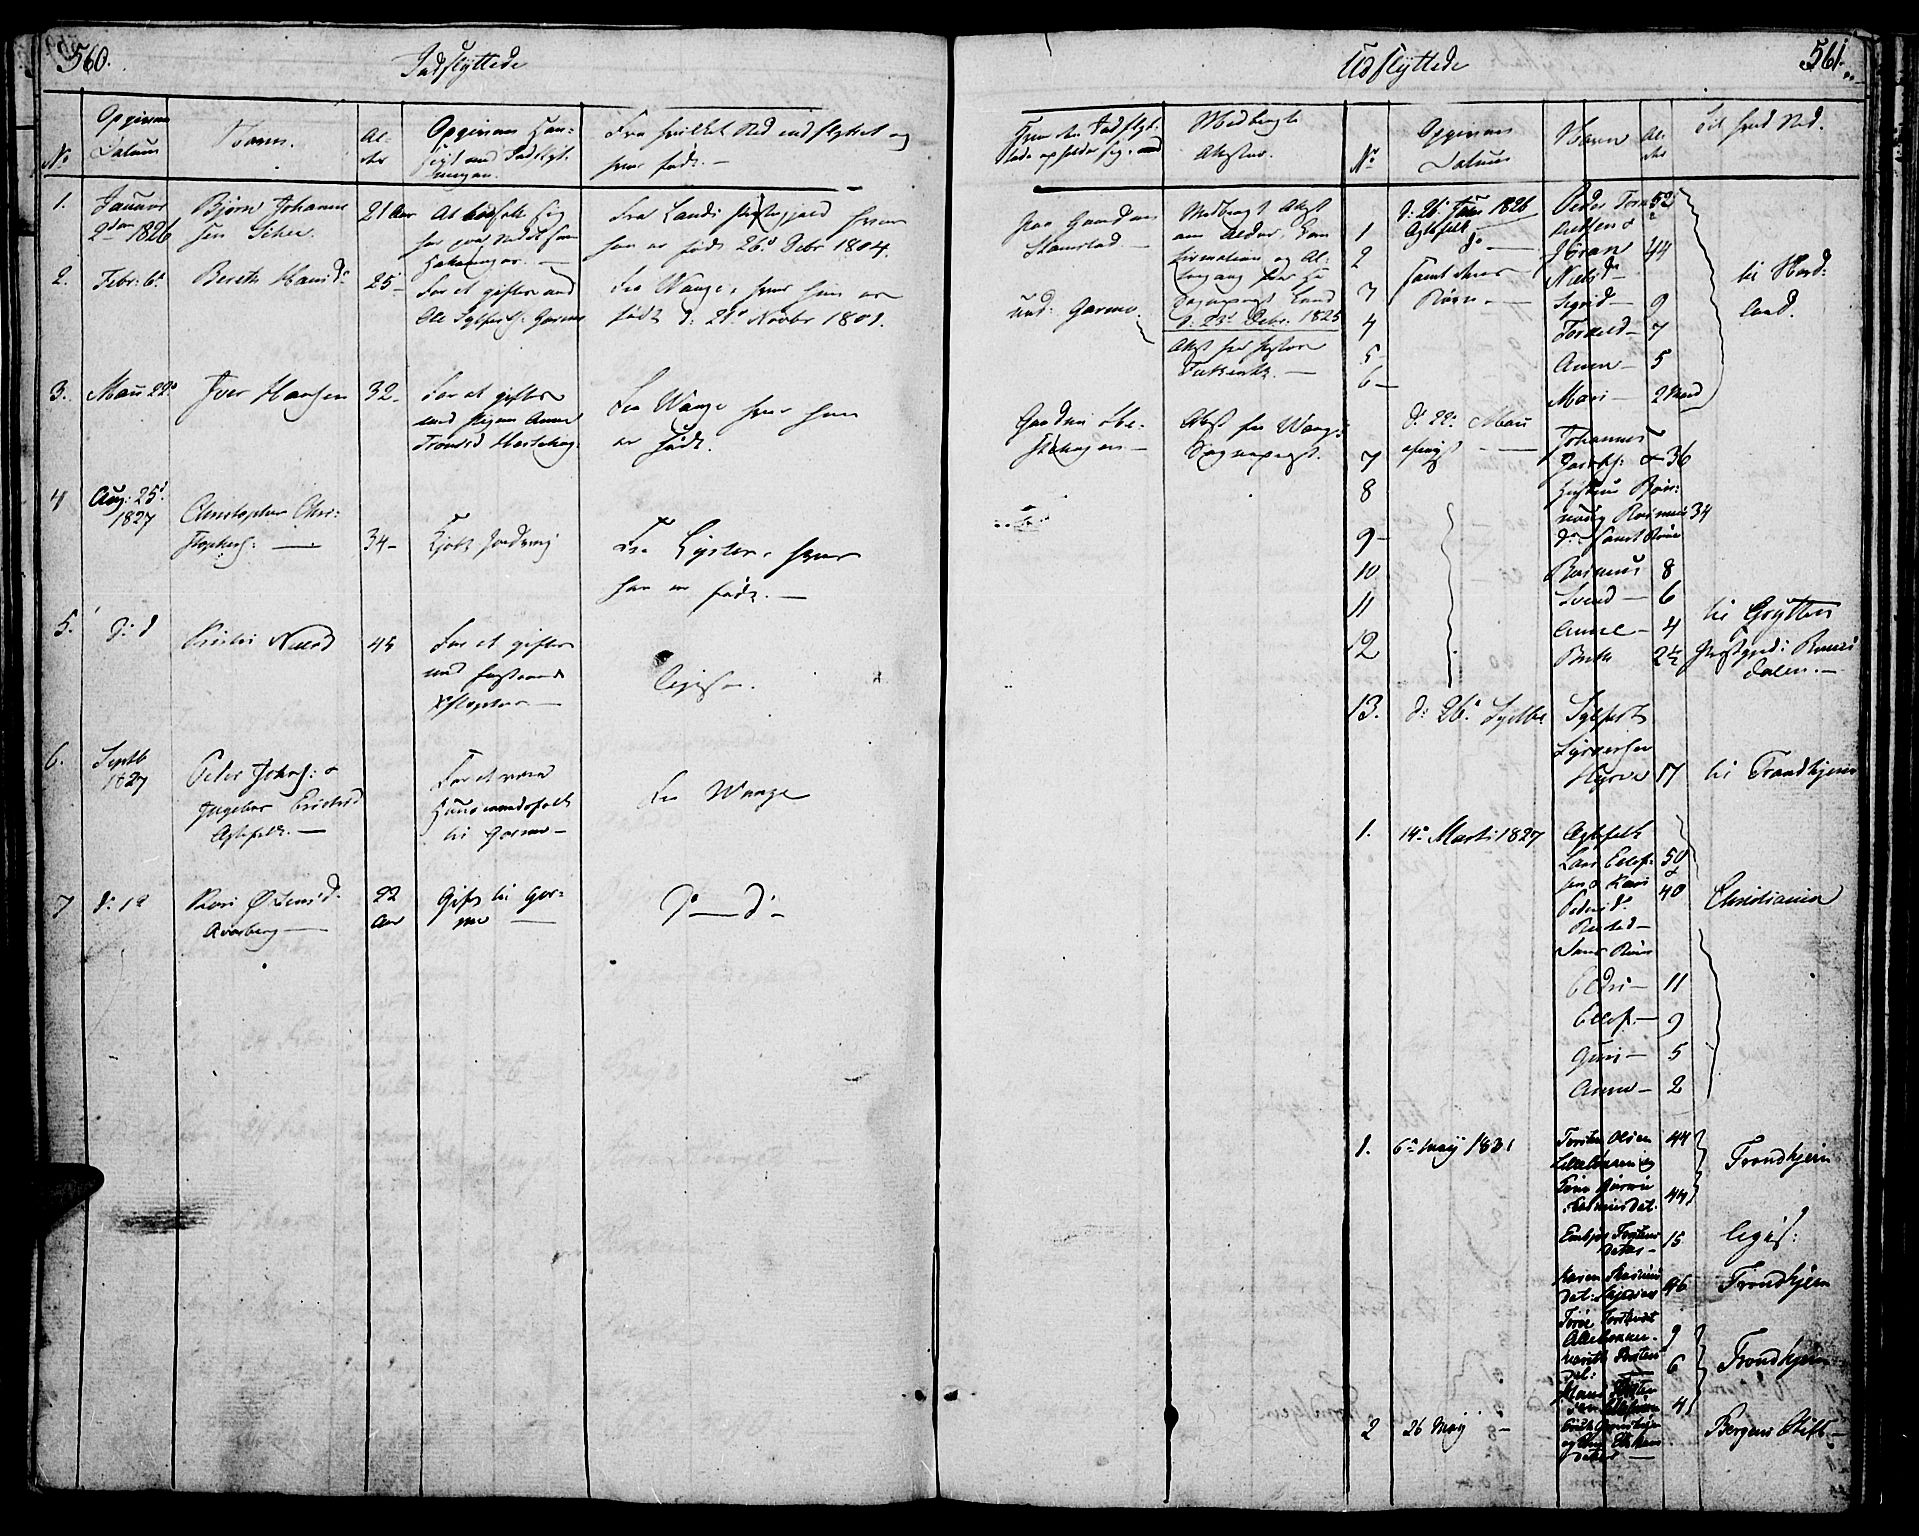 SAH, Lom prestekontor, K/L0005: Parish register (official) no. 5, 1825-1837, p. 560-561